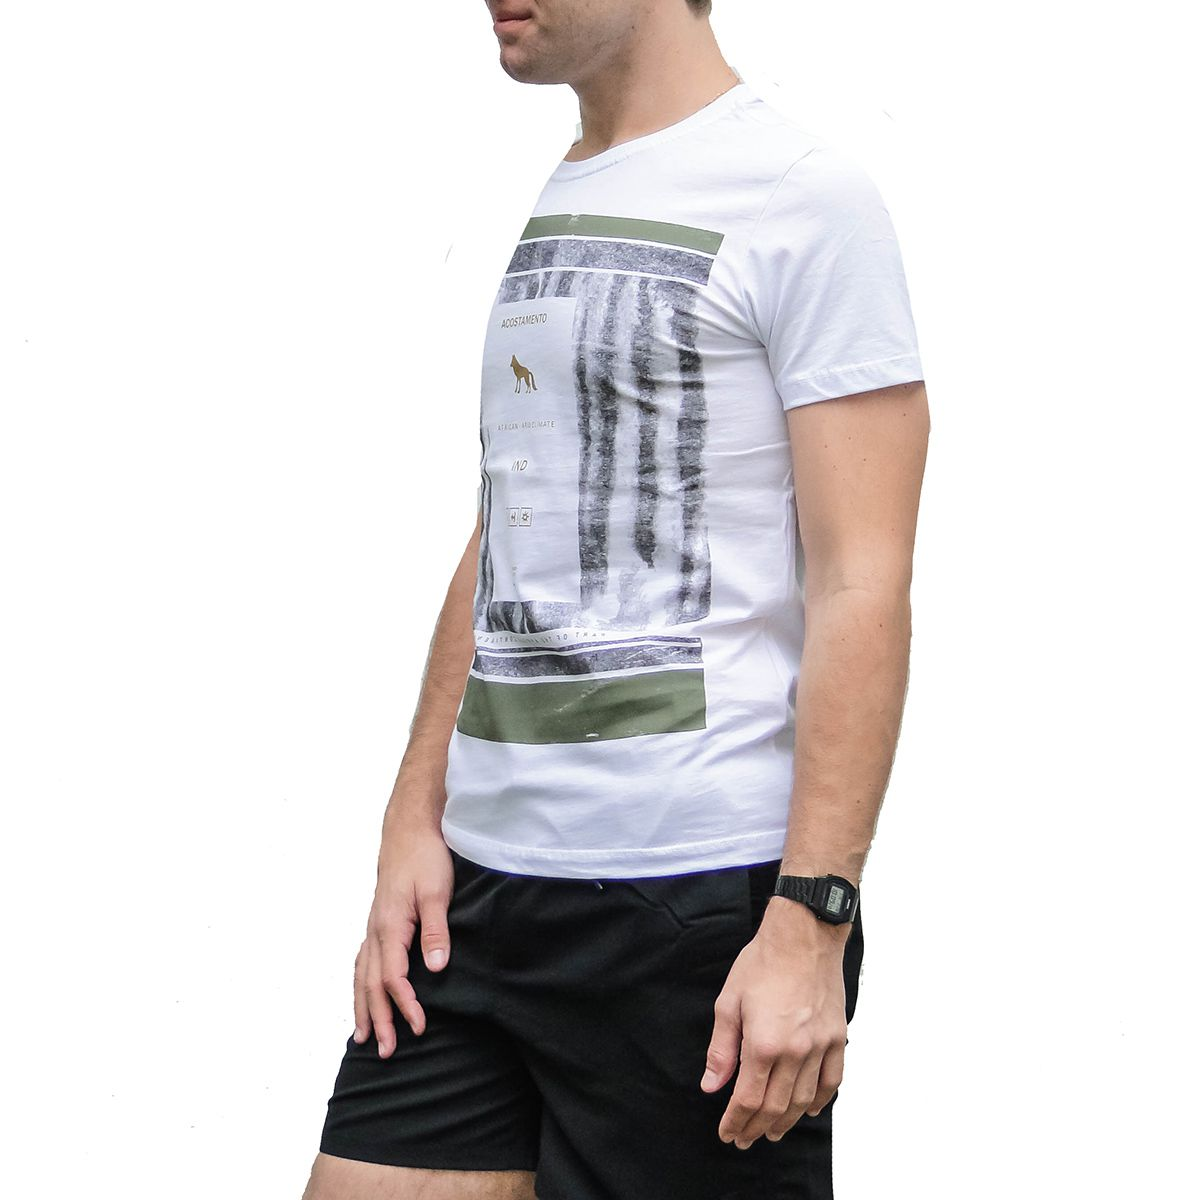 Camiseta Acostamento Masculina Branca Africa Continente